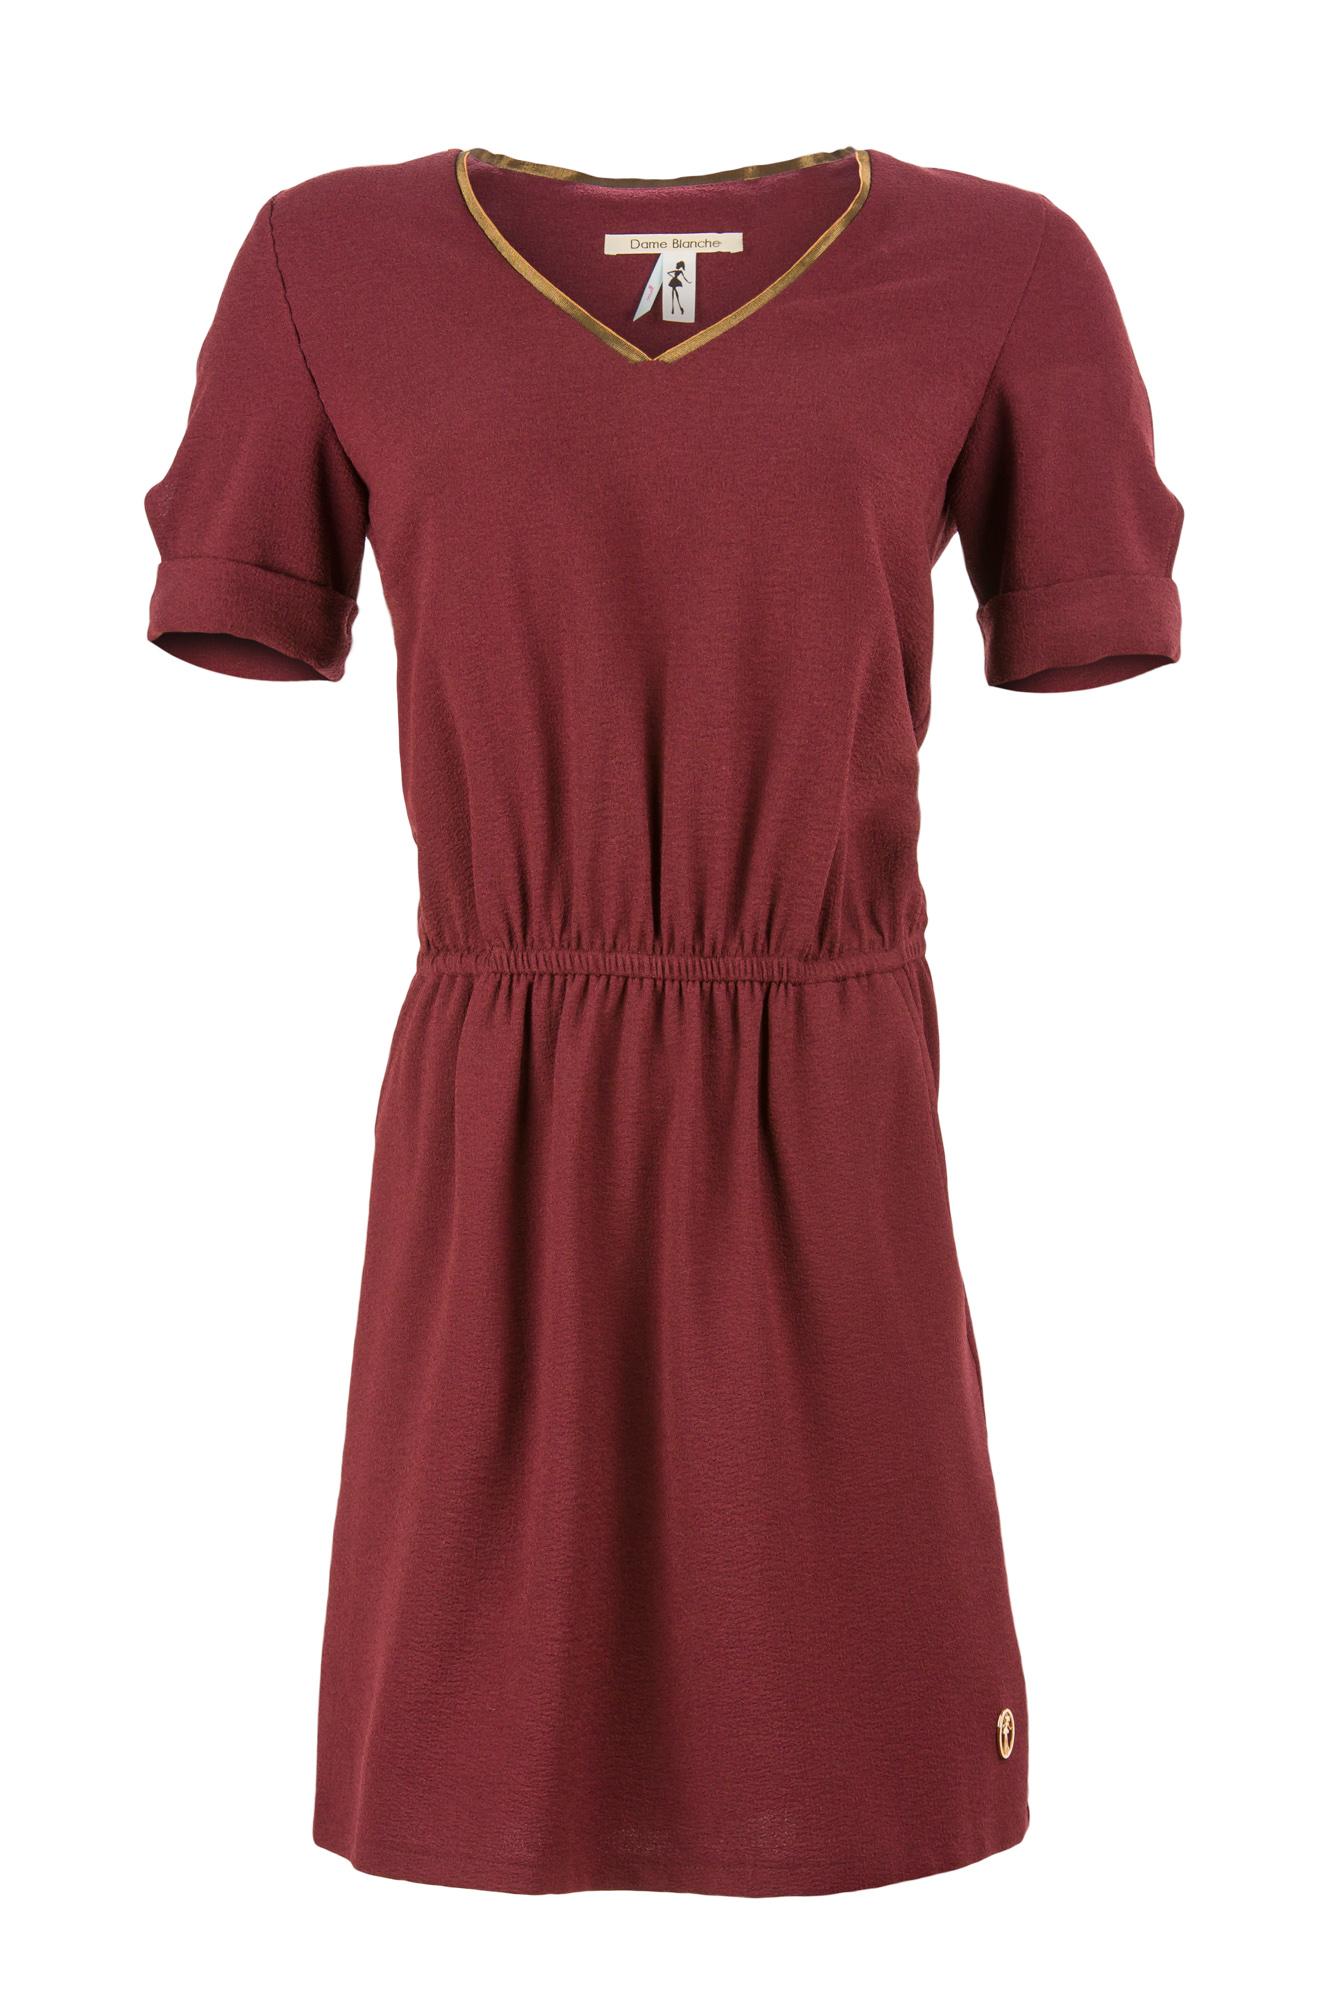 Dame Blanche - Dress Winered Gold-4.jpg